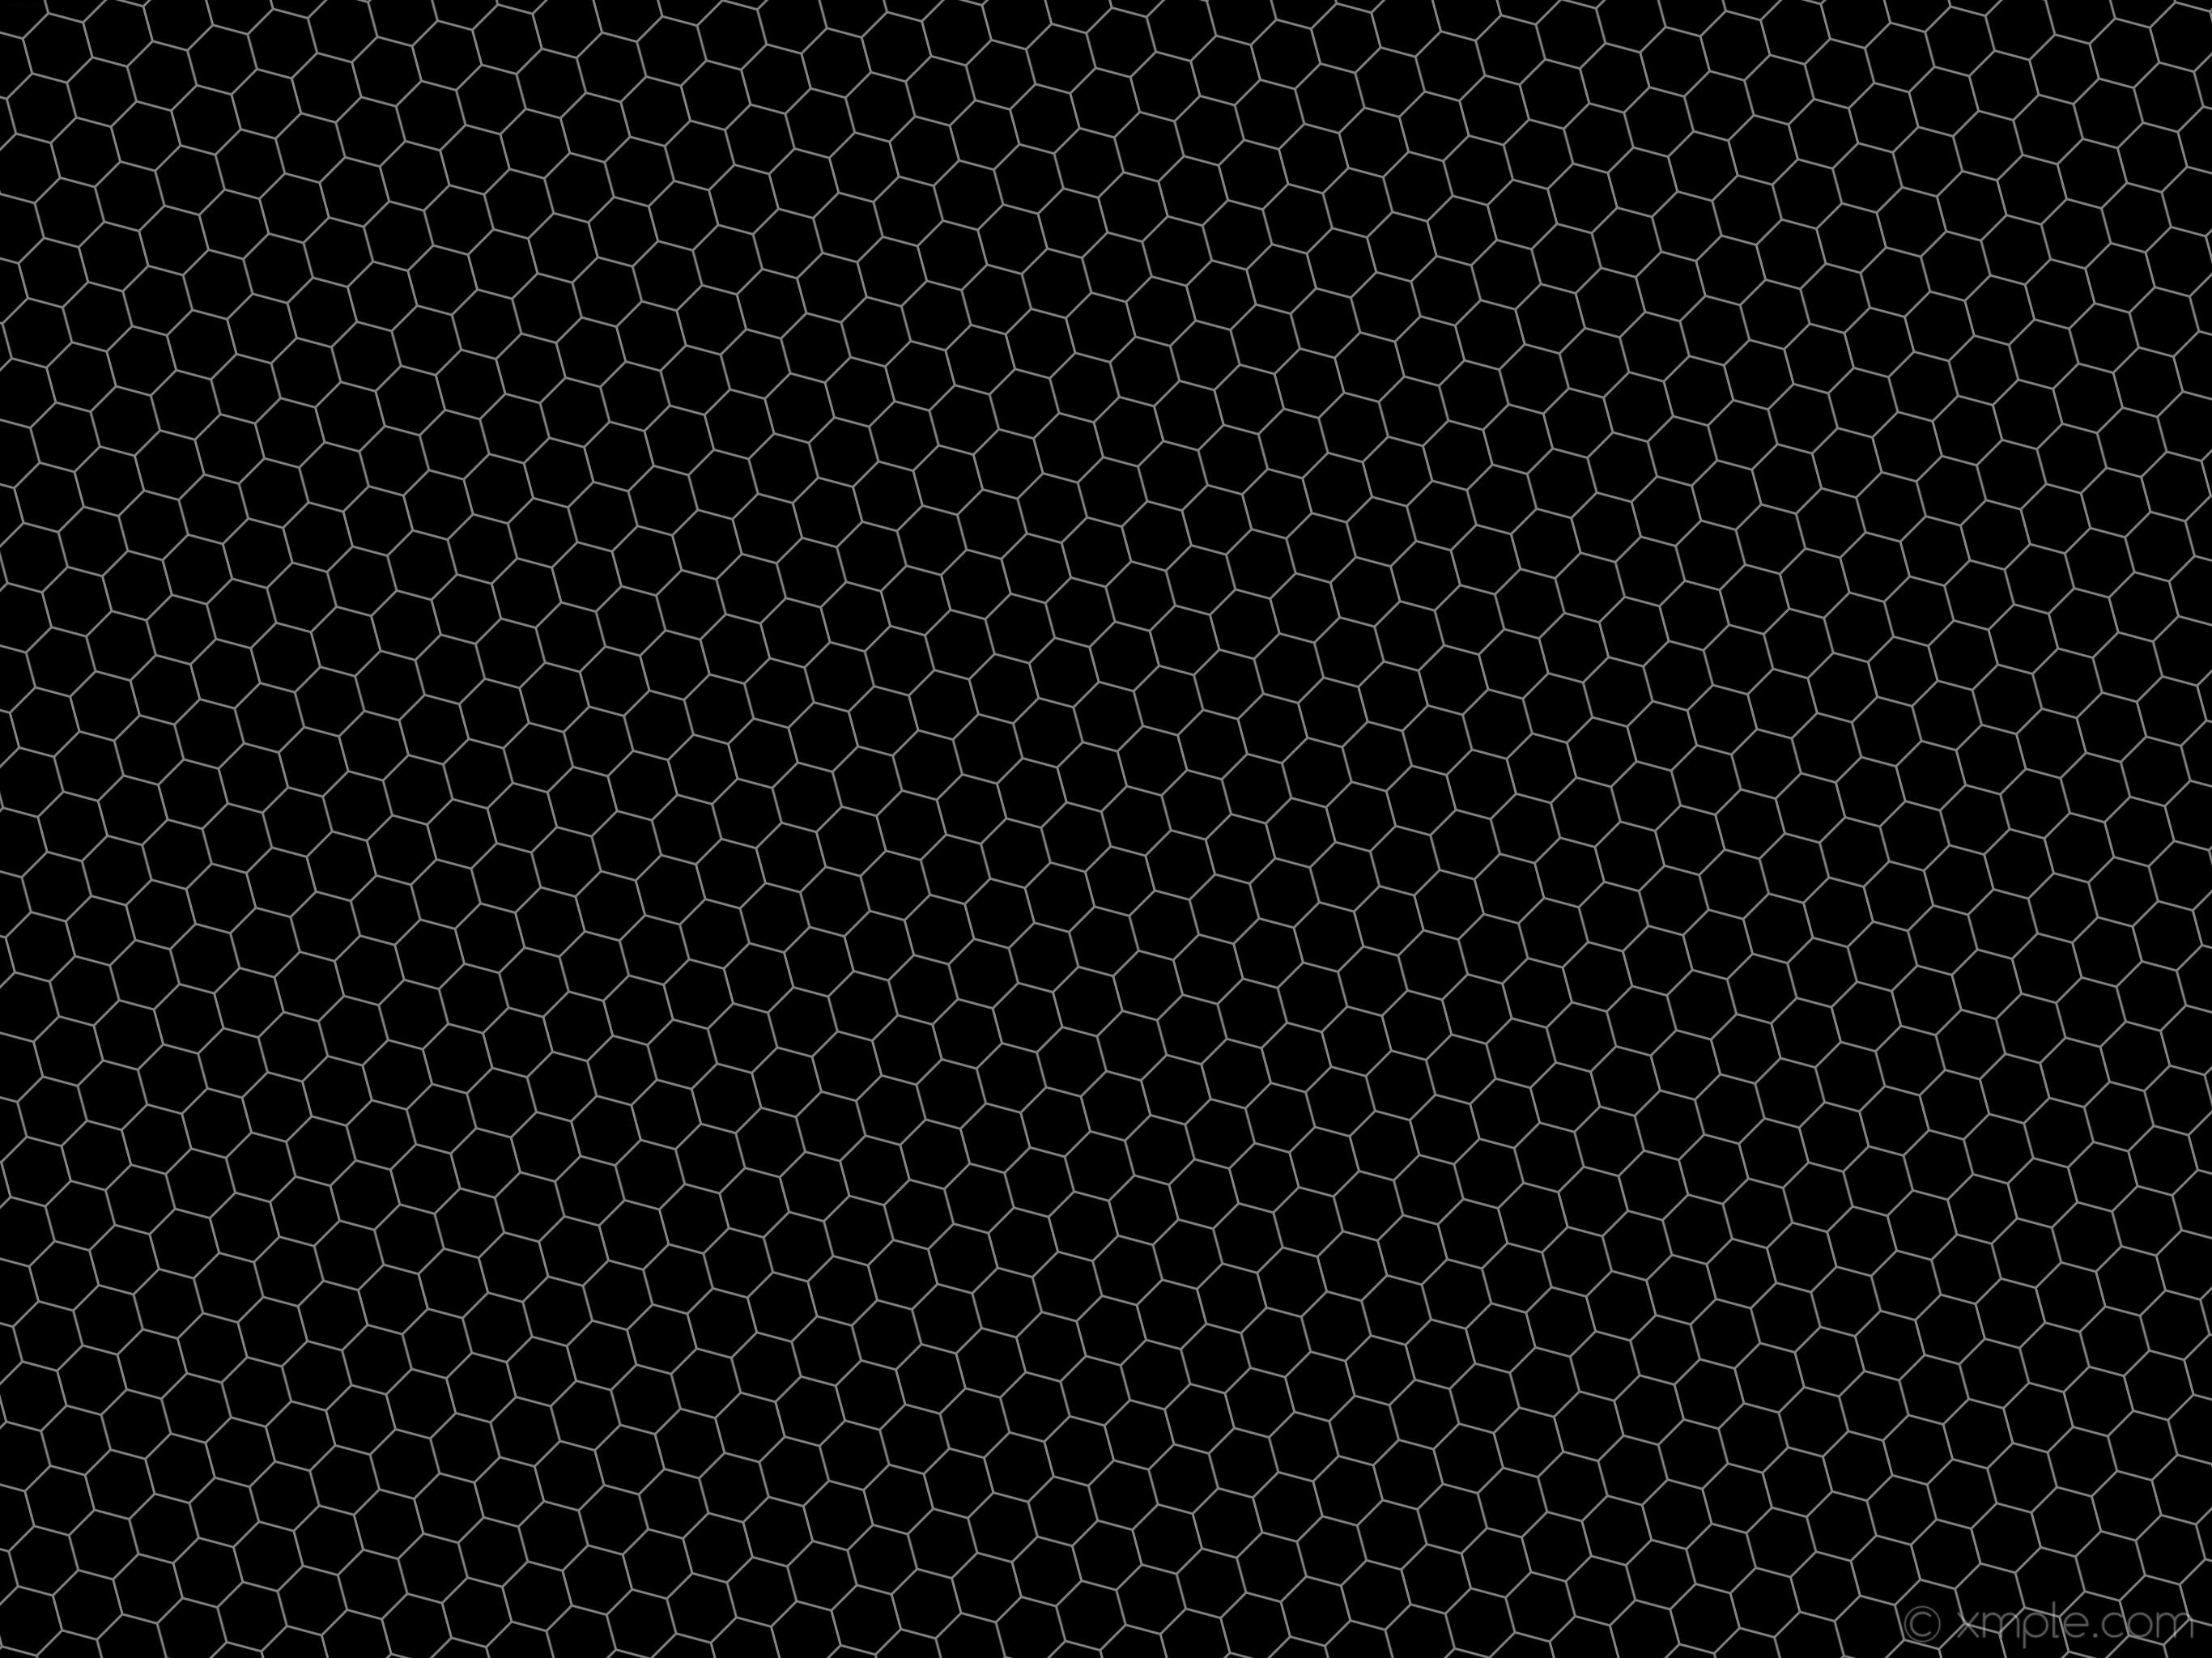 Black Honeycomb Wallpaper 69 Images